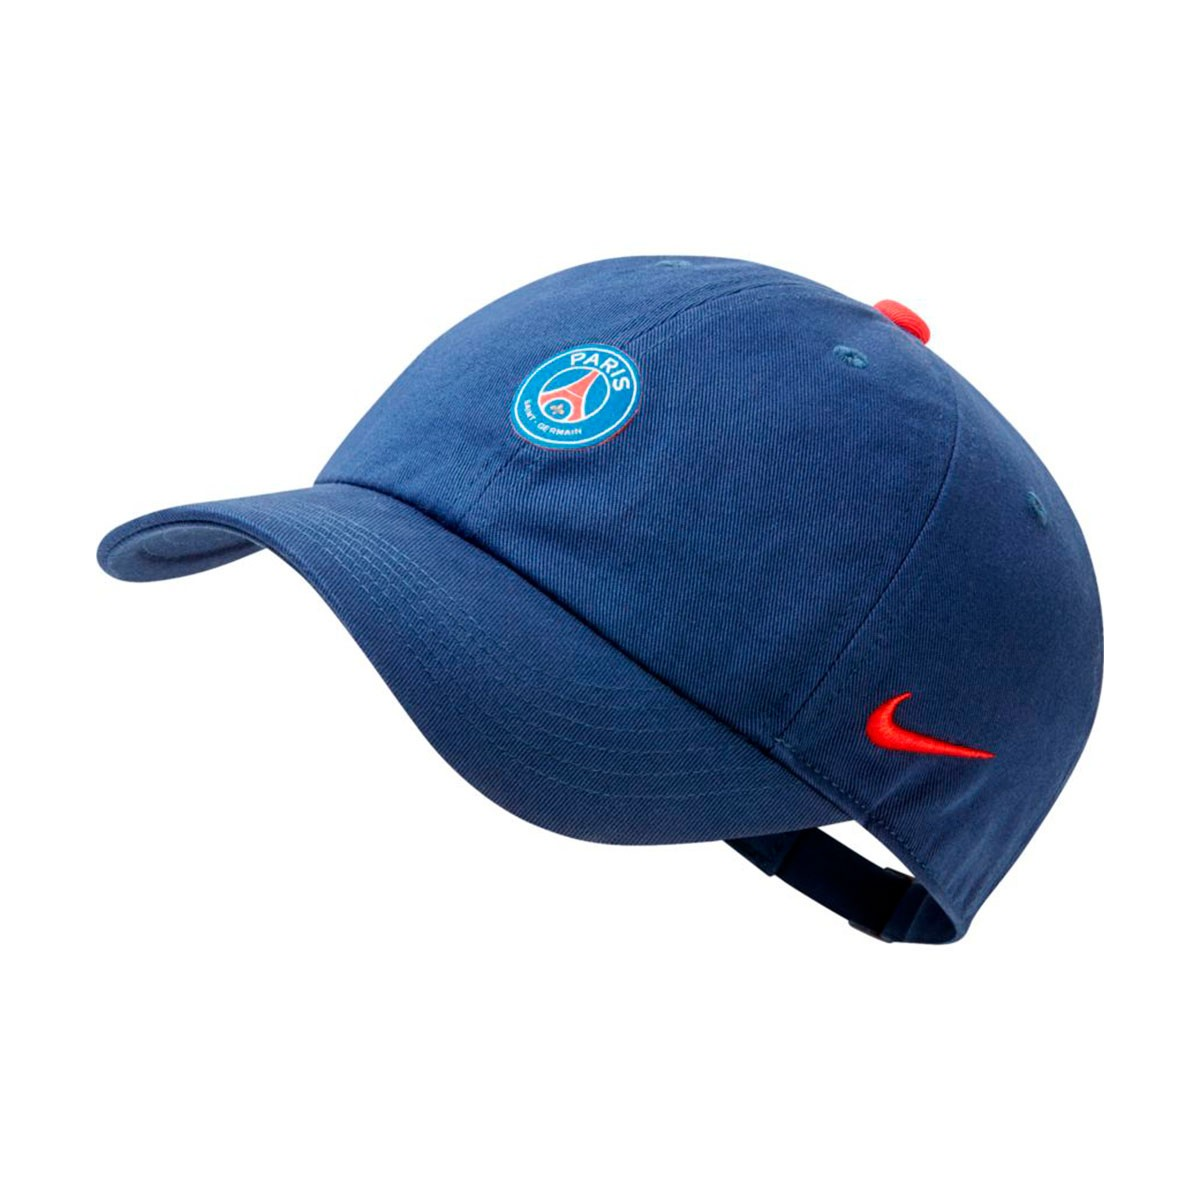 21346751f3b39 Casquette Nike Paris Saint-Germain Heritage86 2018-2019 Enfant Midnight  navy-Challenge red - Boutique de football Fútbol Emotion